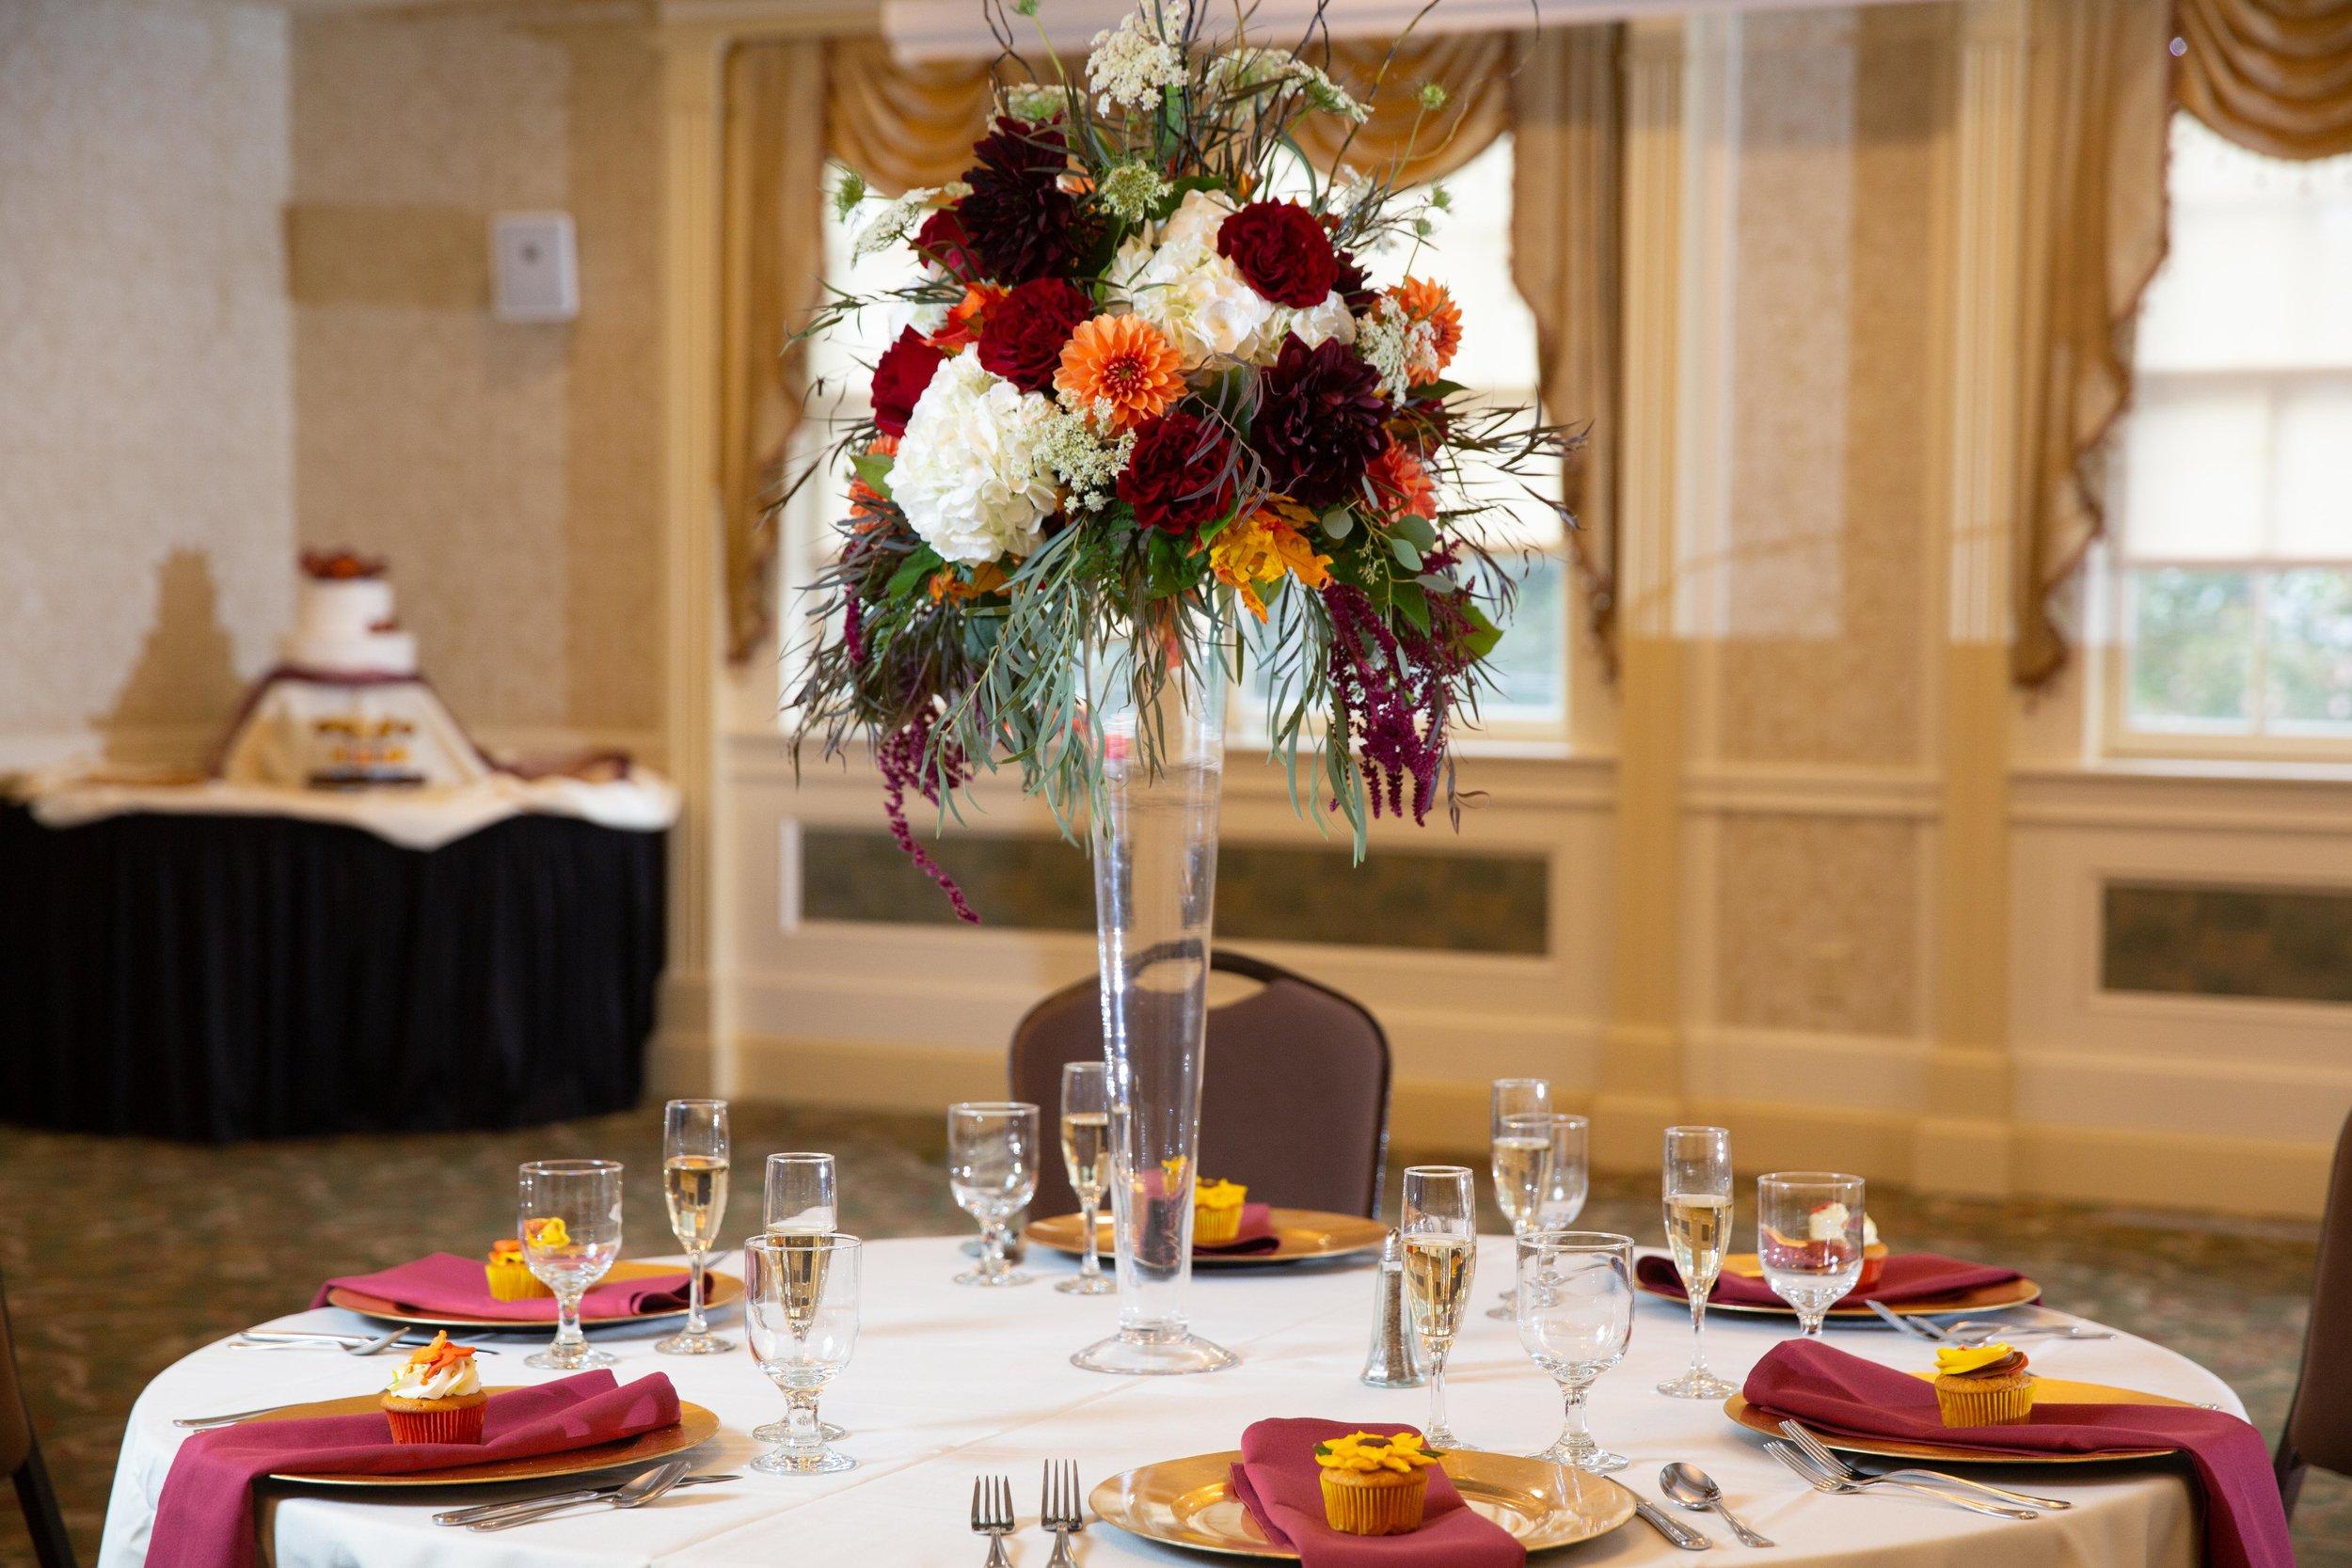 Table setting in ballroom